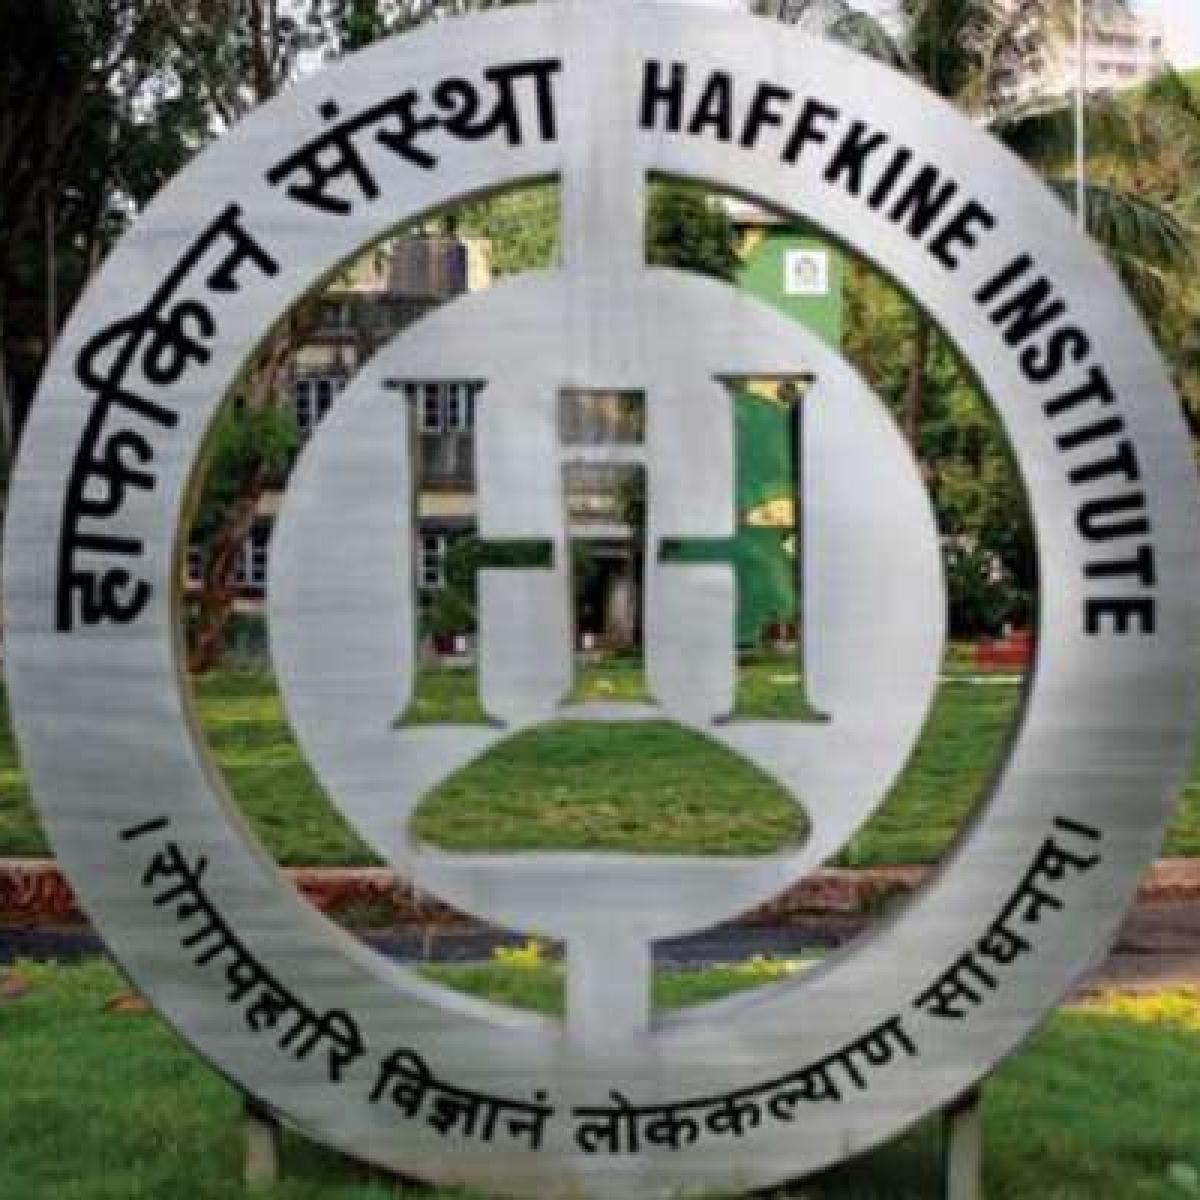 COVID-19 vaccine: Maharashtra govt gives Rs 94 crore to Haffkine Bio Pharma from contingency fund